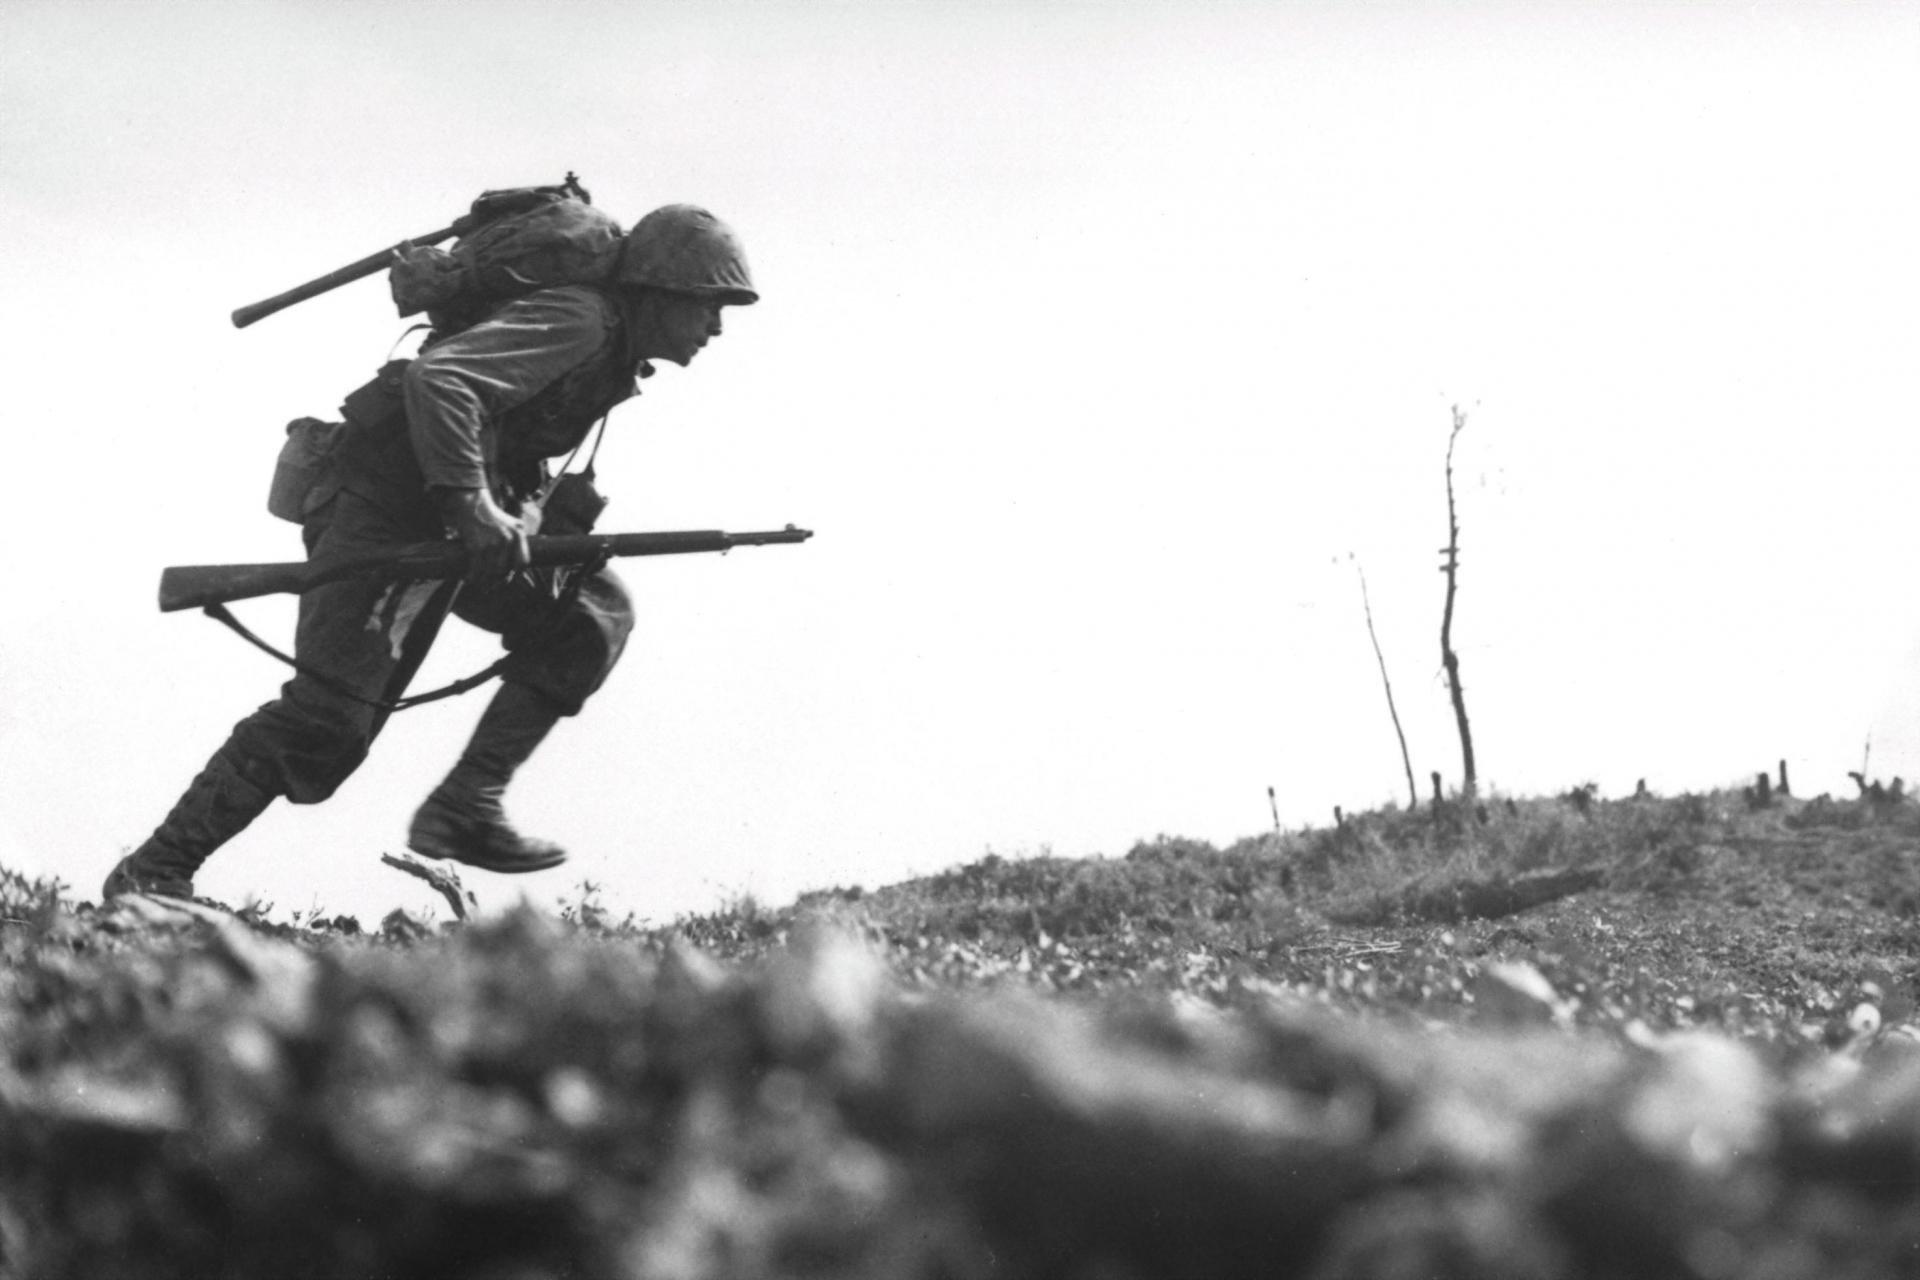 World War 2 (WW2) Wallpapers HD For Desktop Backgrounds